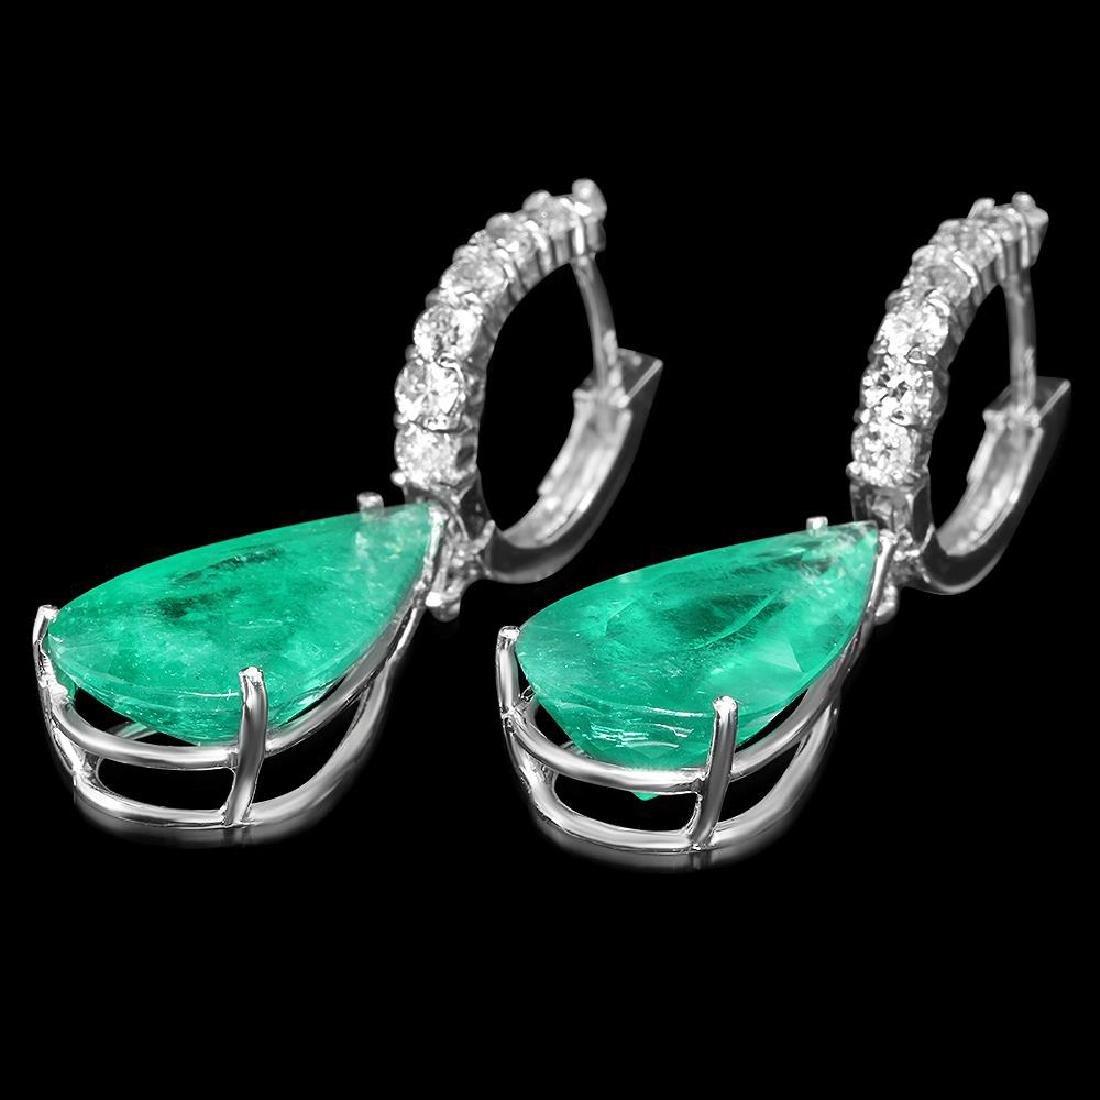 14K Gold 19.70ct Emerald 1.30ct Diamond Earrings - 2